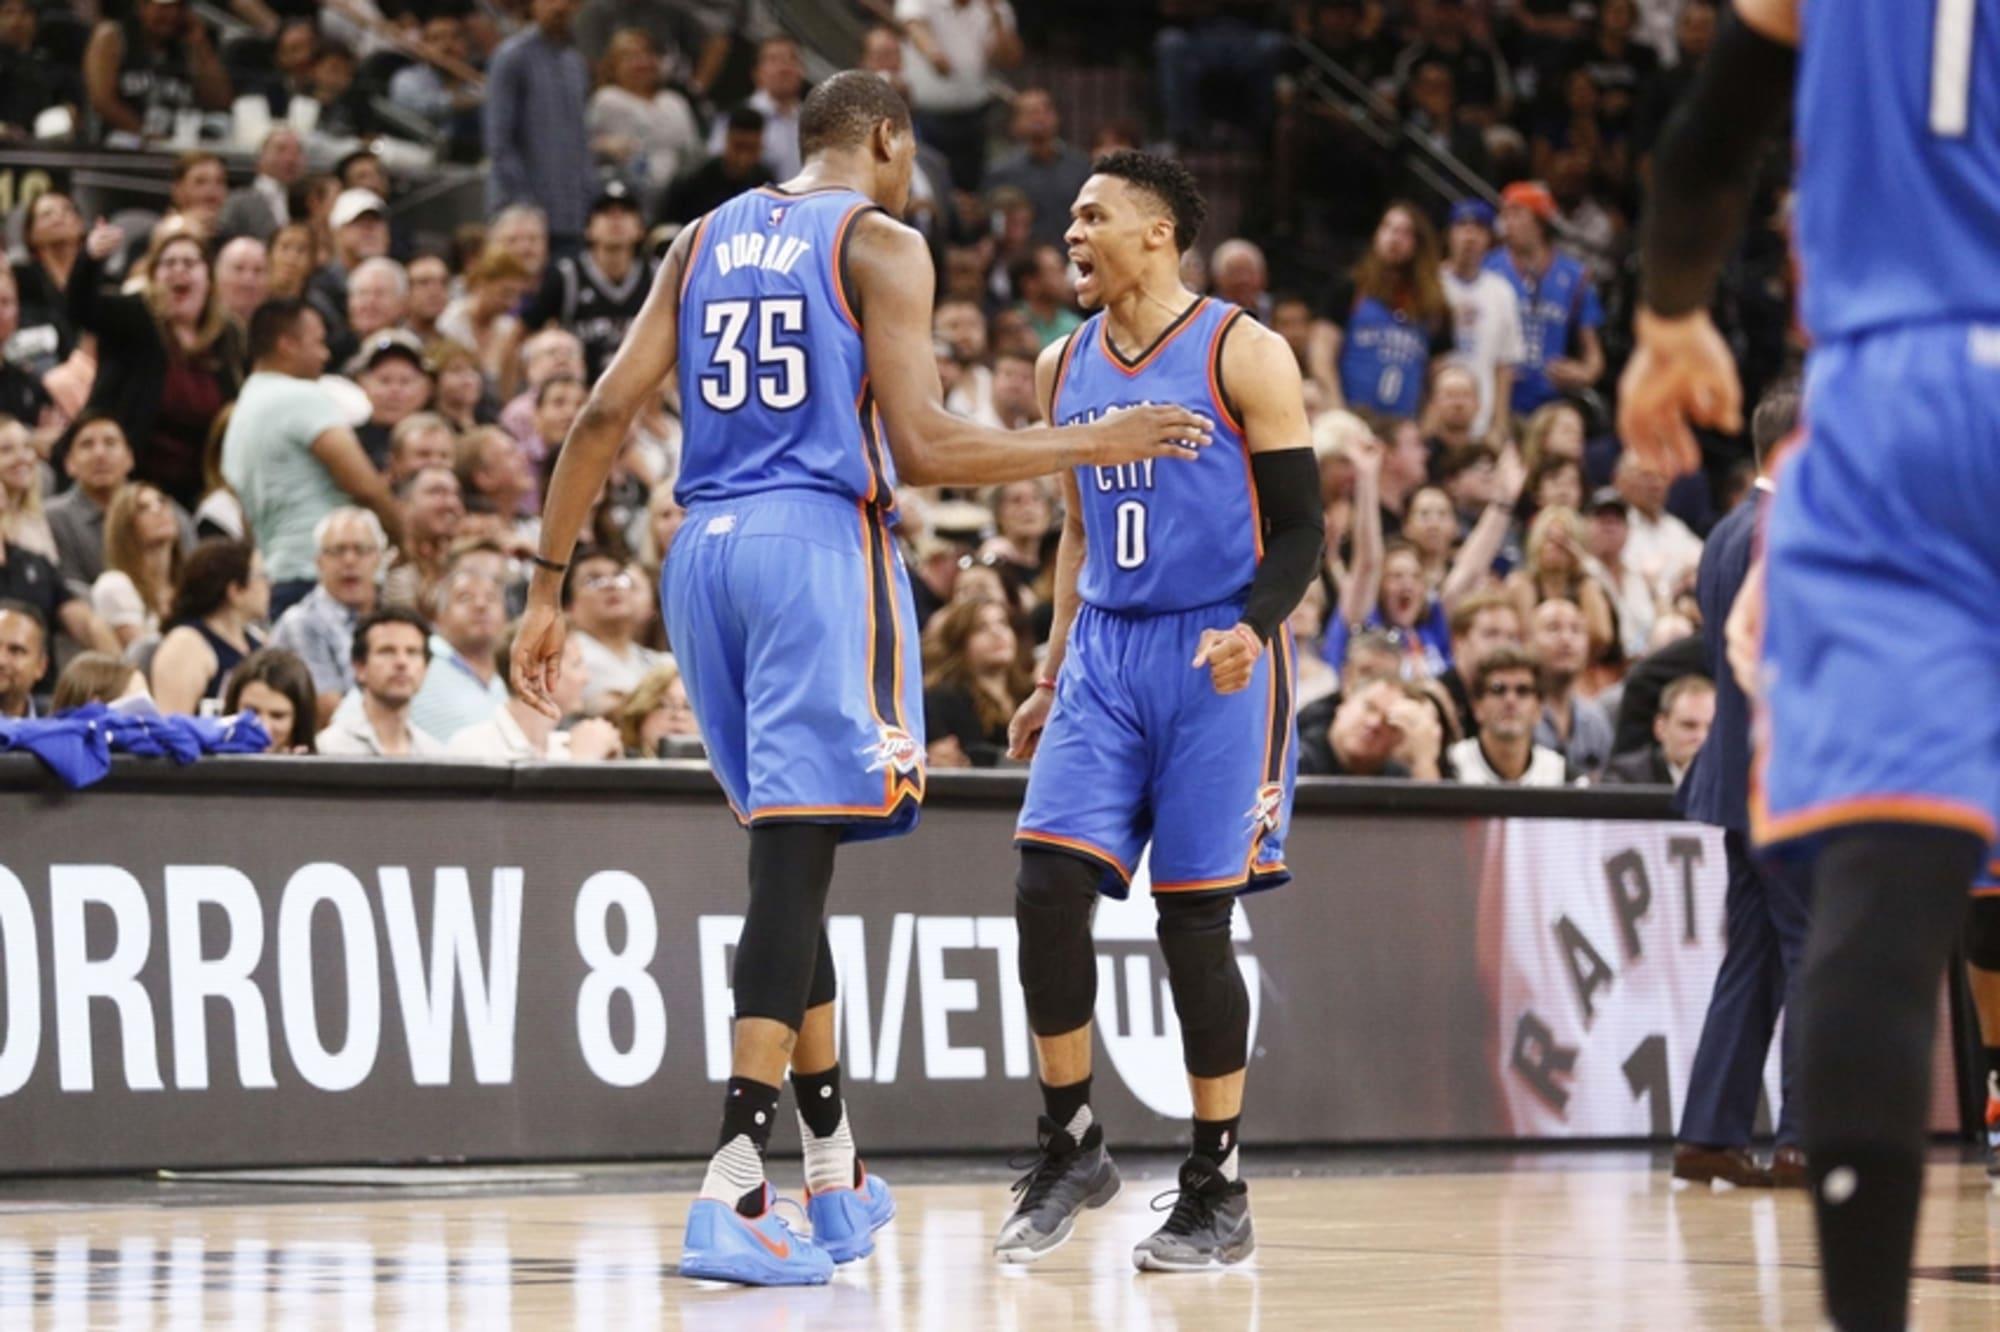 2016 NBA Playoffs: Final Play Of Spurs vs. Thunder Game 2